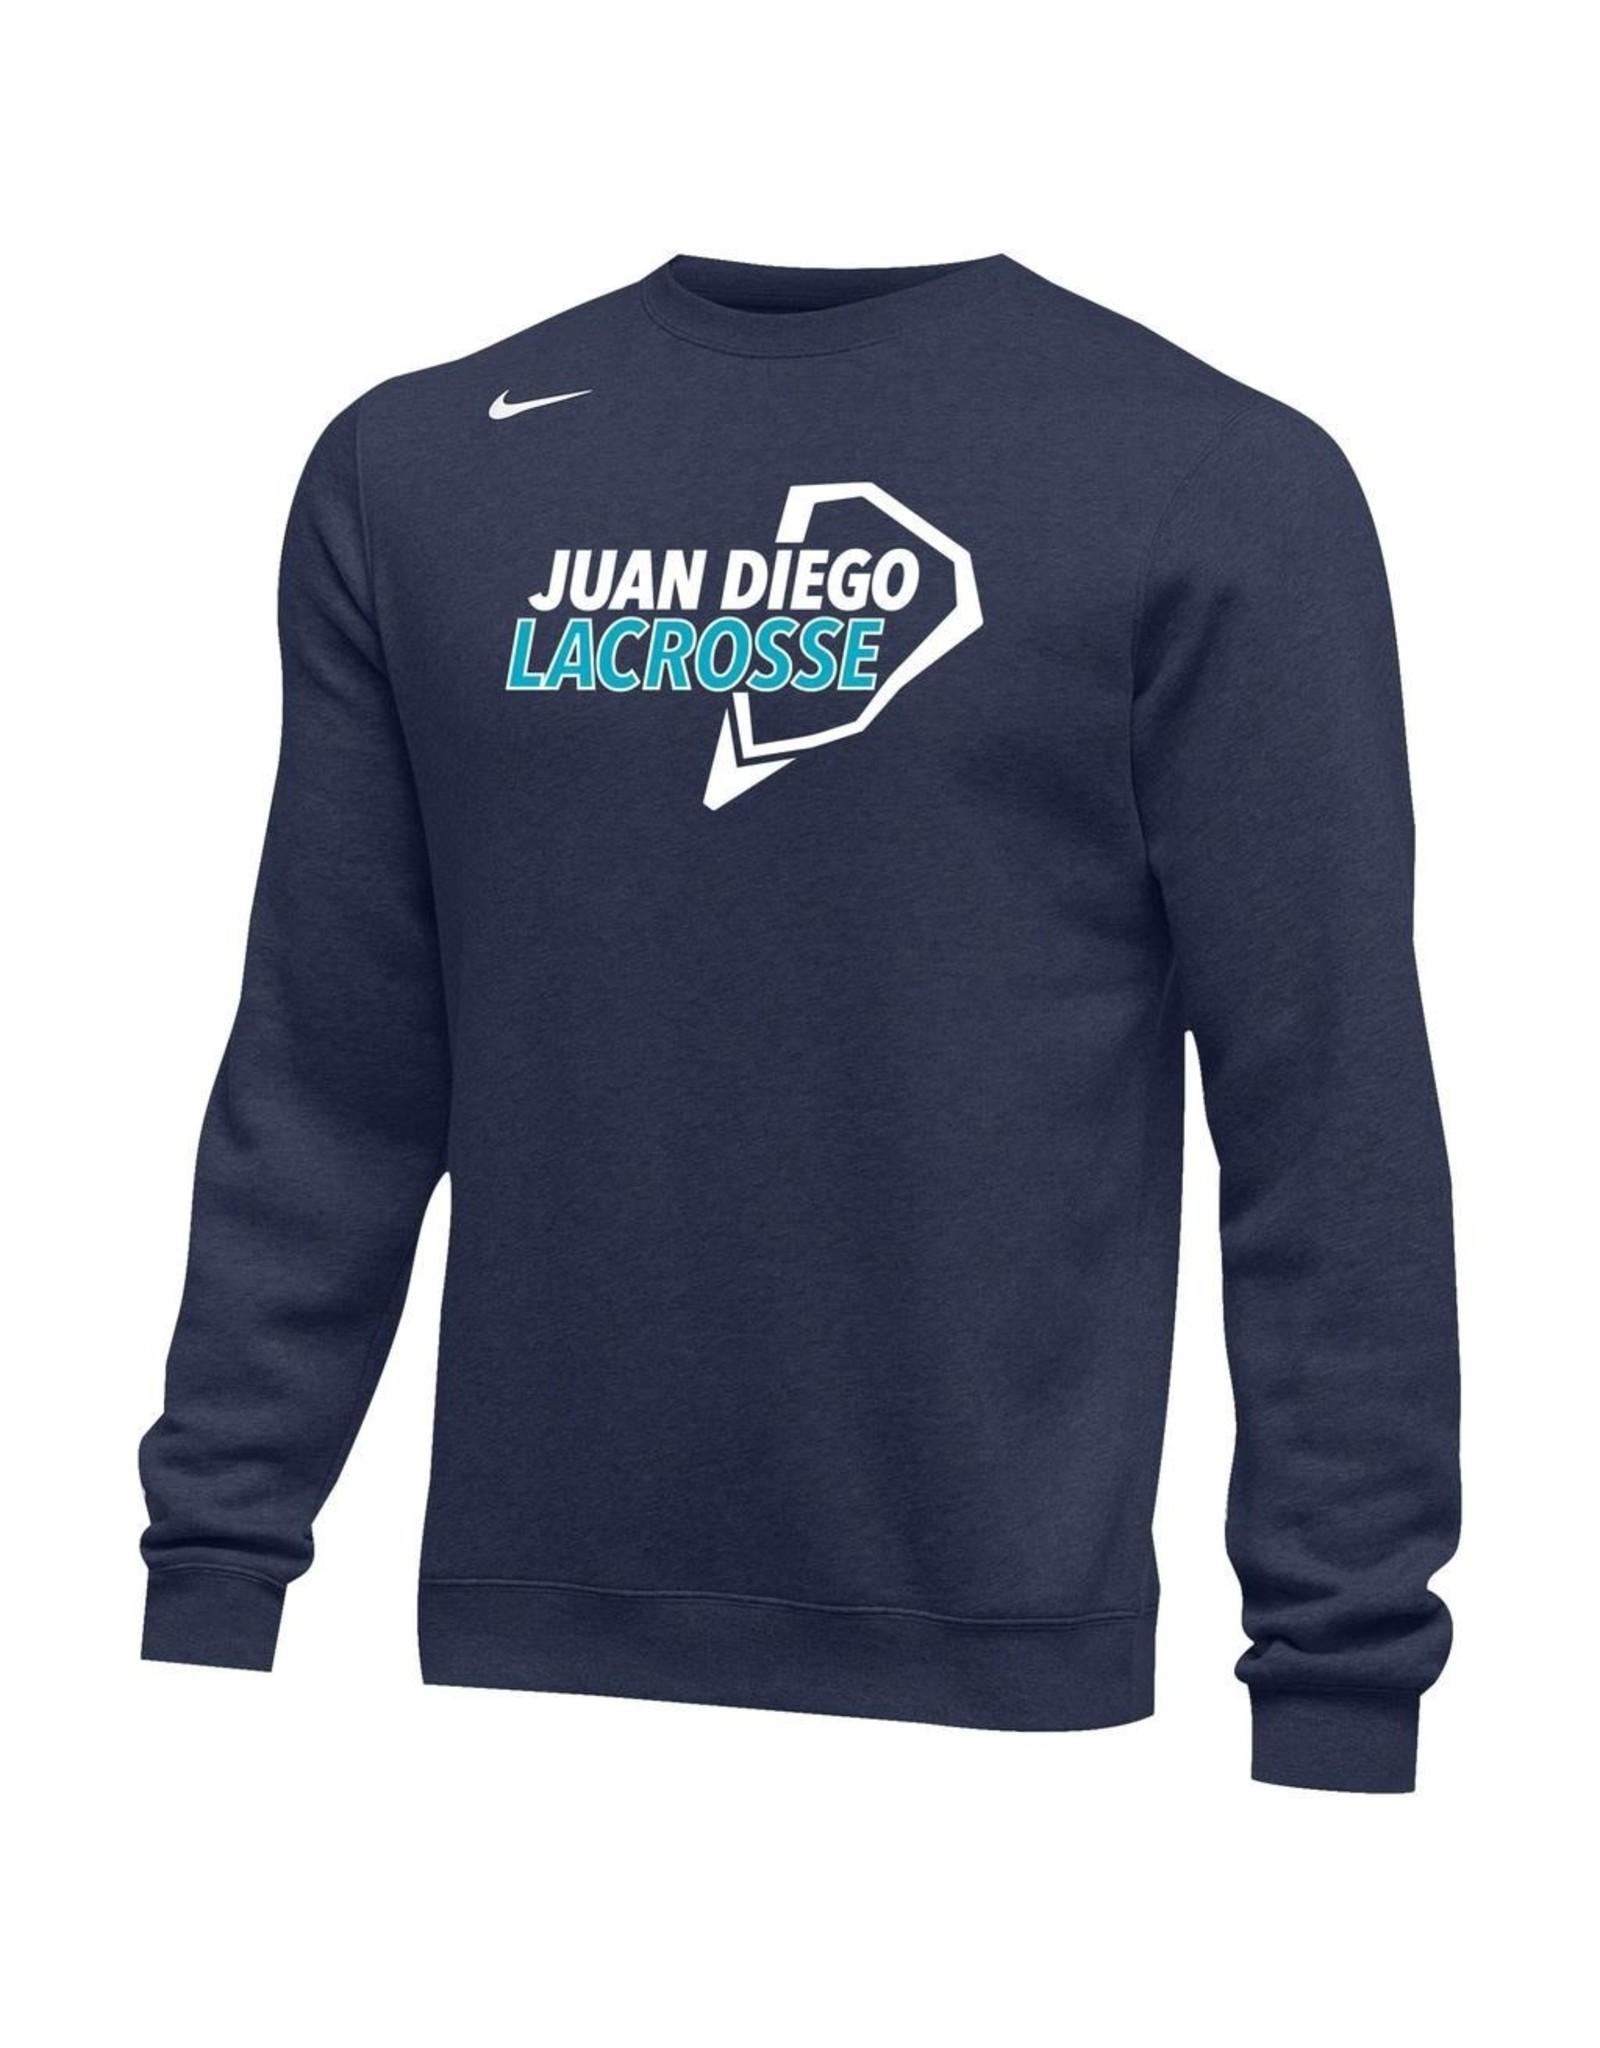 NON-UNIFORM Lacrosse - Custom JD Lacrosse Crew Neck Sweatshirt, Unisex